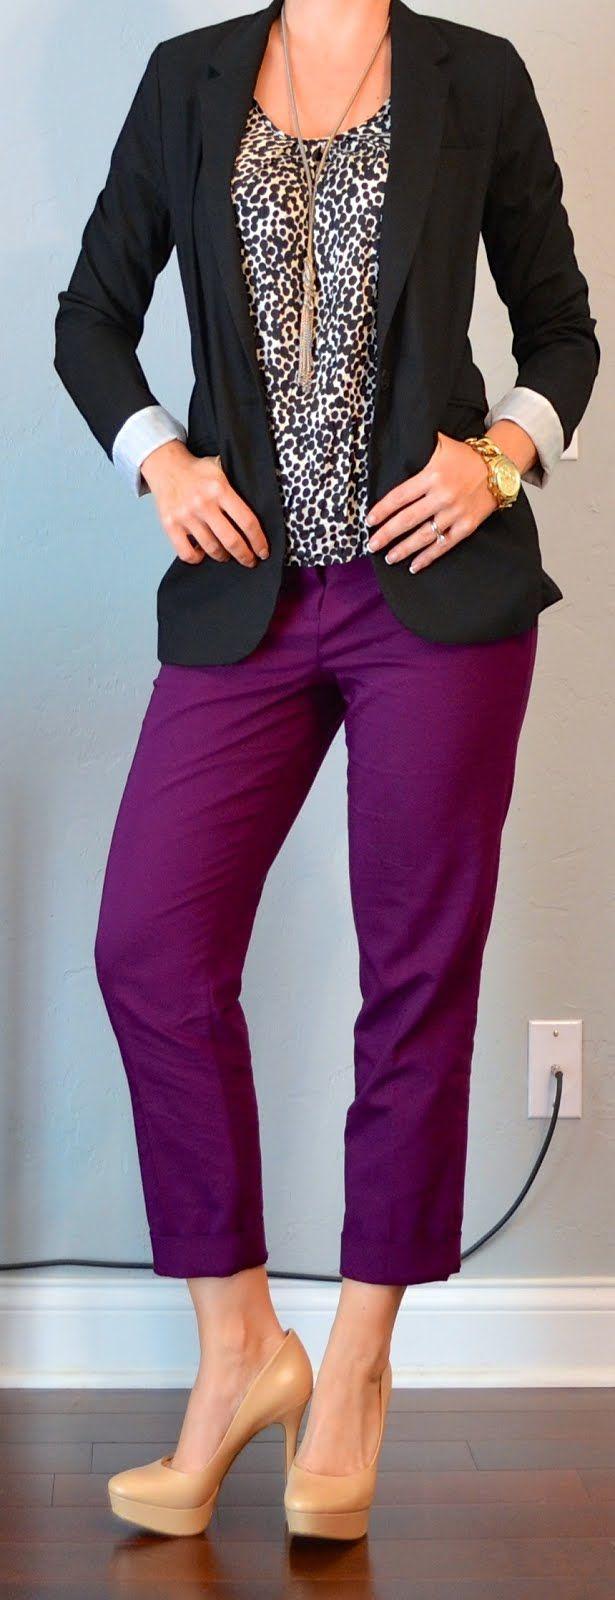 outfit post: black blazer, polkadot blouse, purple cropped pant | Outfit Posts Dynamic